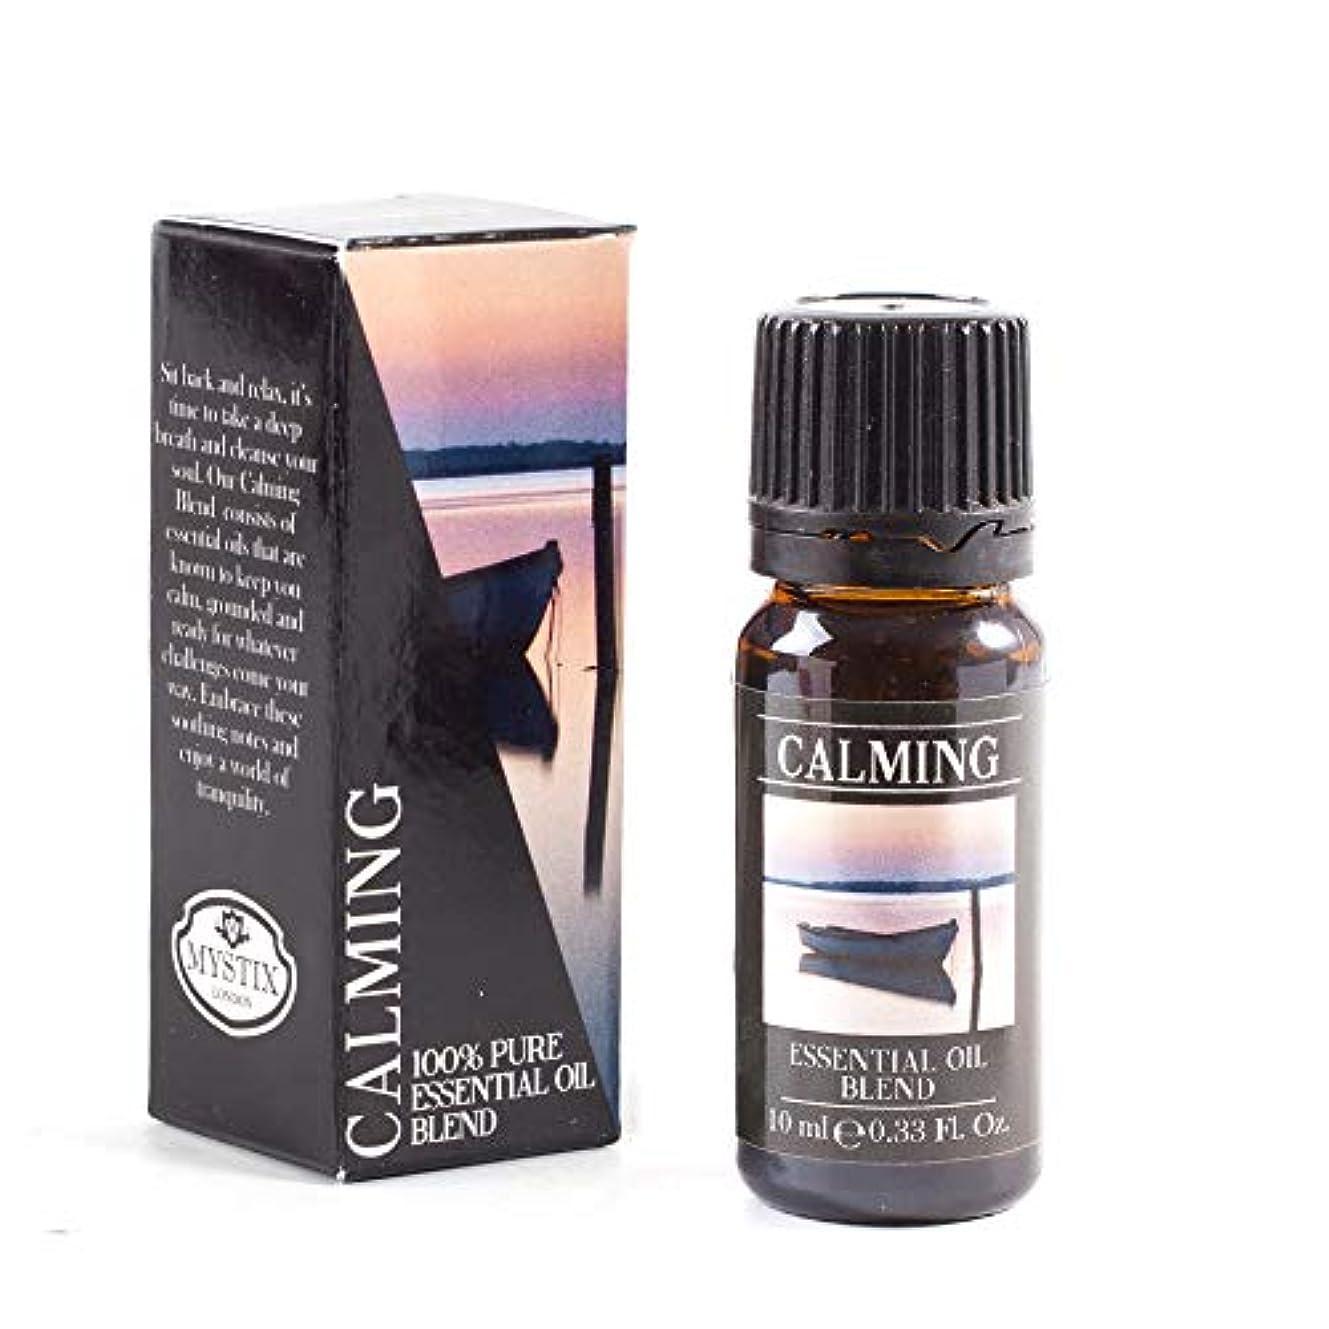 辛な特派員恩赦Mystix London   Calming Essential Oil Blend - 10ml - 100% Pure